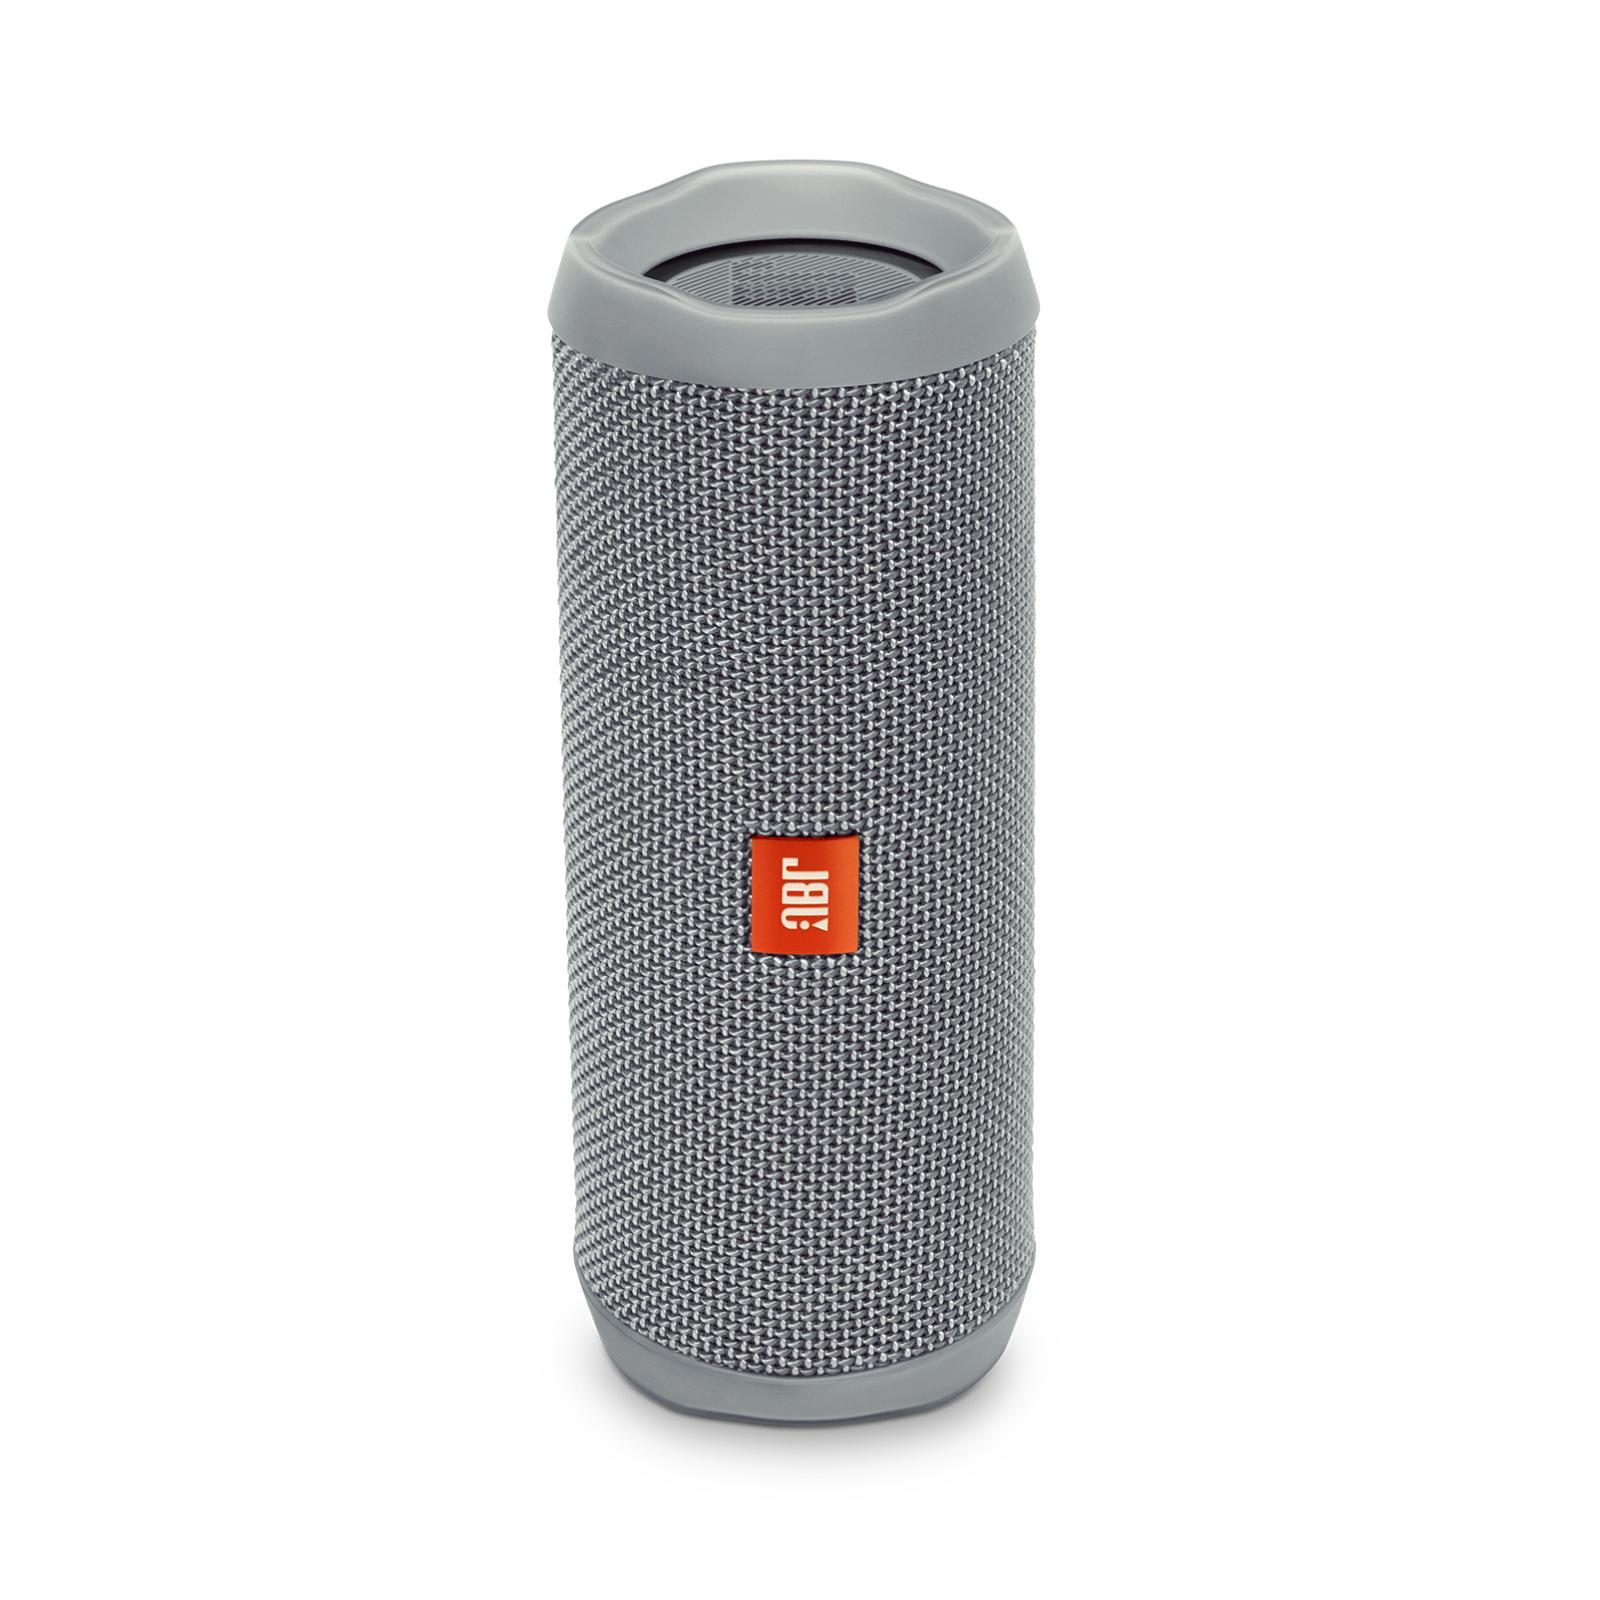 JBL FLIP 4 Portable Bluetooth Speaker with 12-Hour